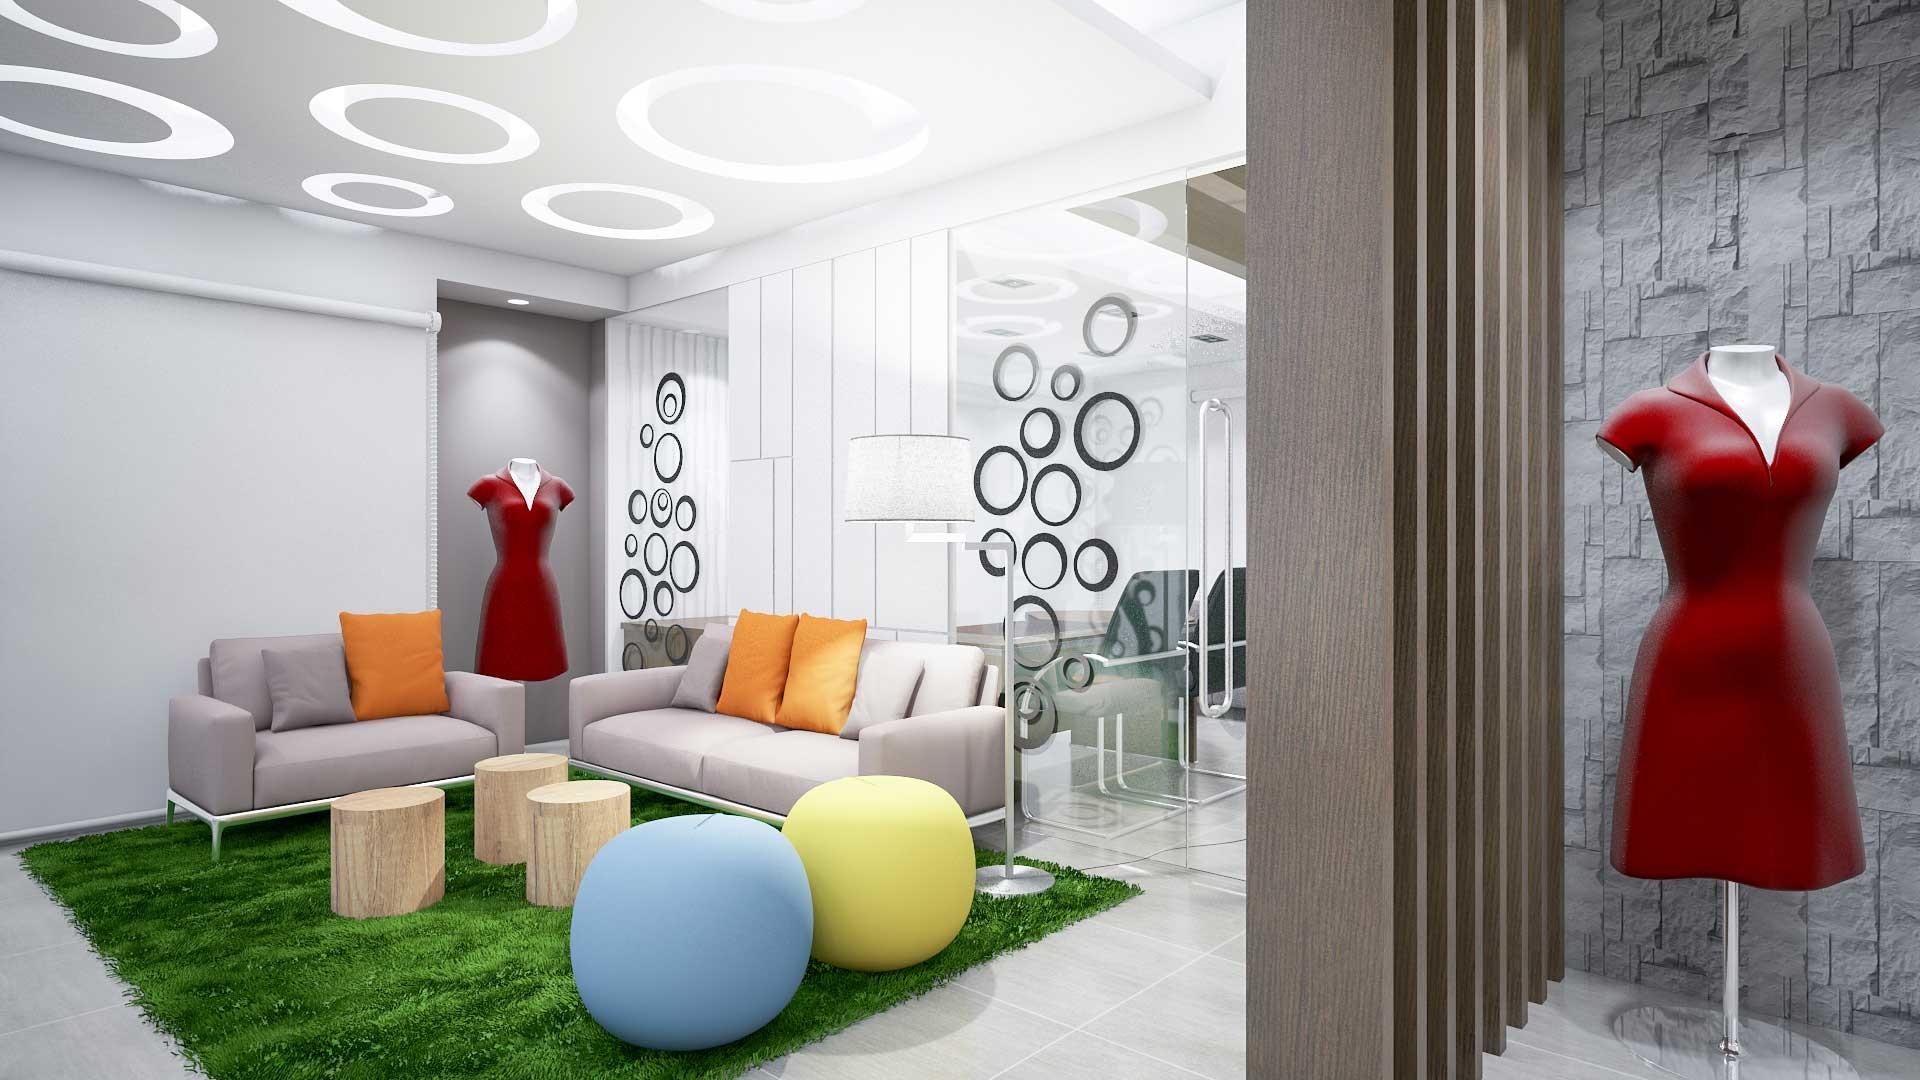 Zero Inch Interiors Ltdinterior Design Company In Bangladesh Office Work  Lounge. small office designs.